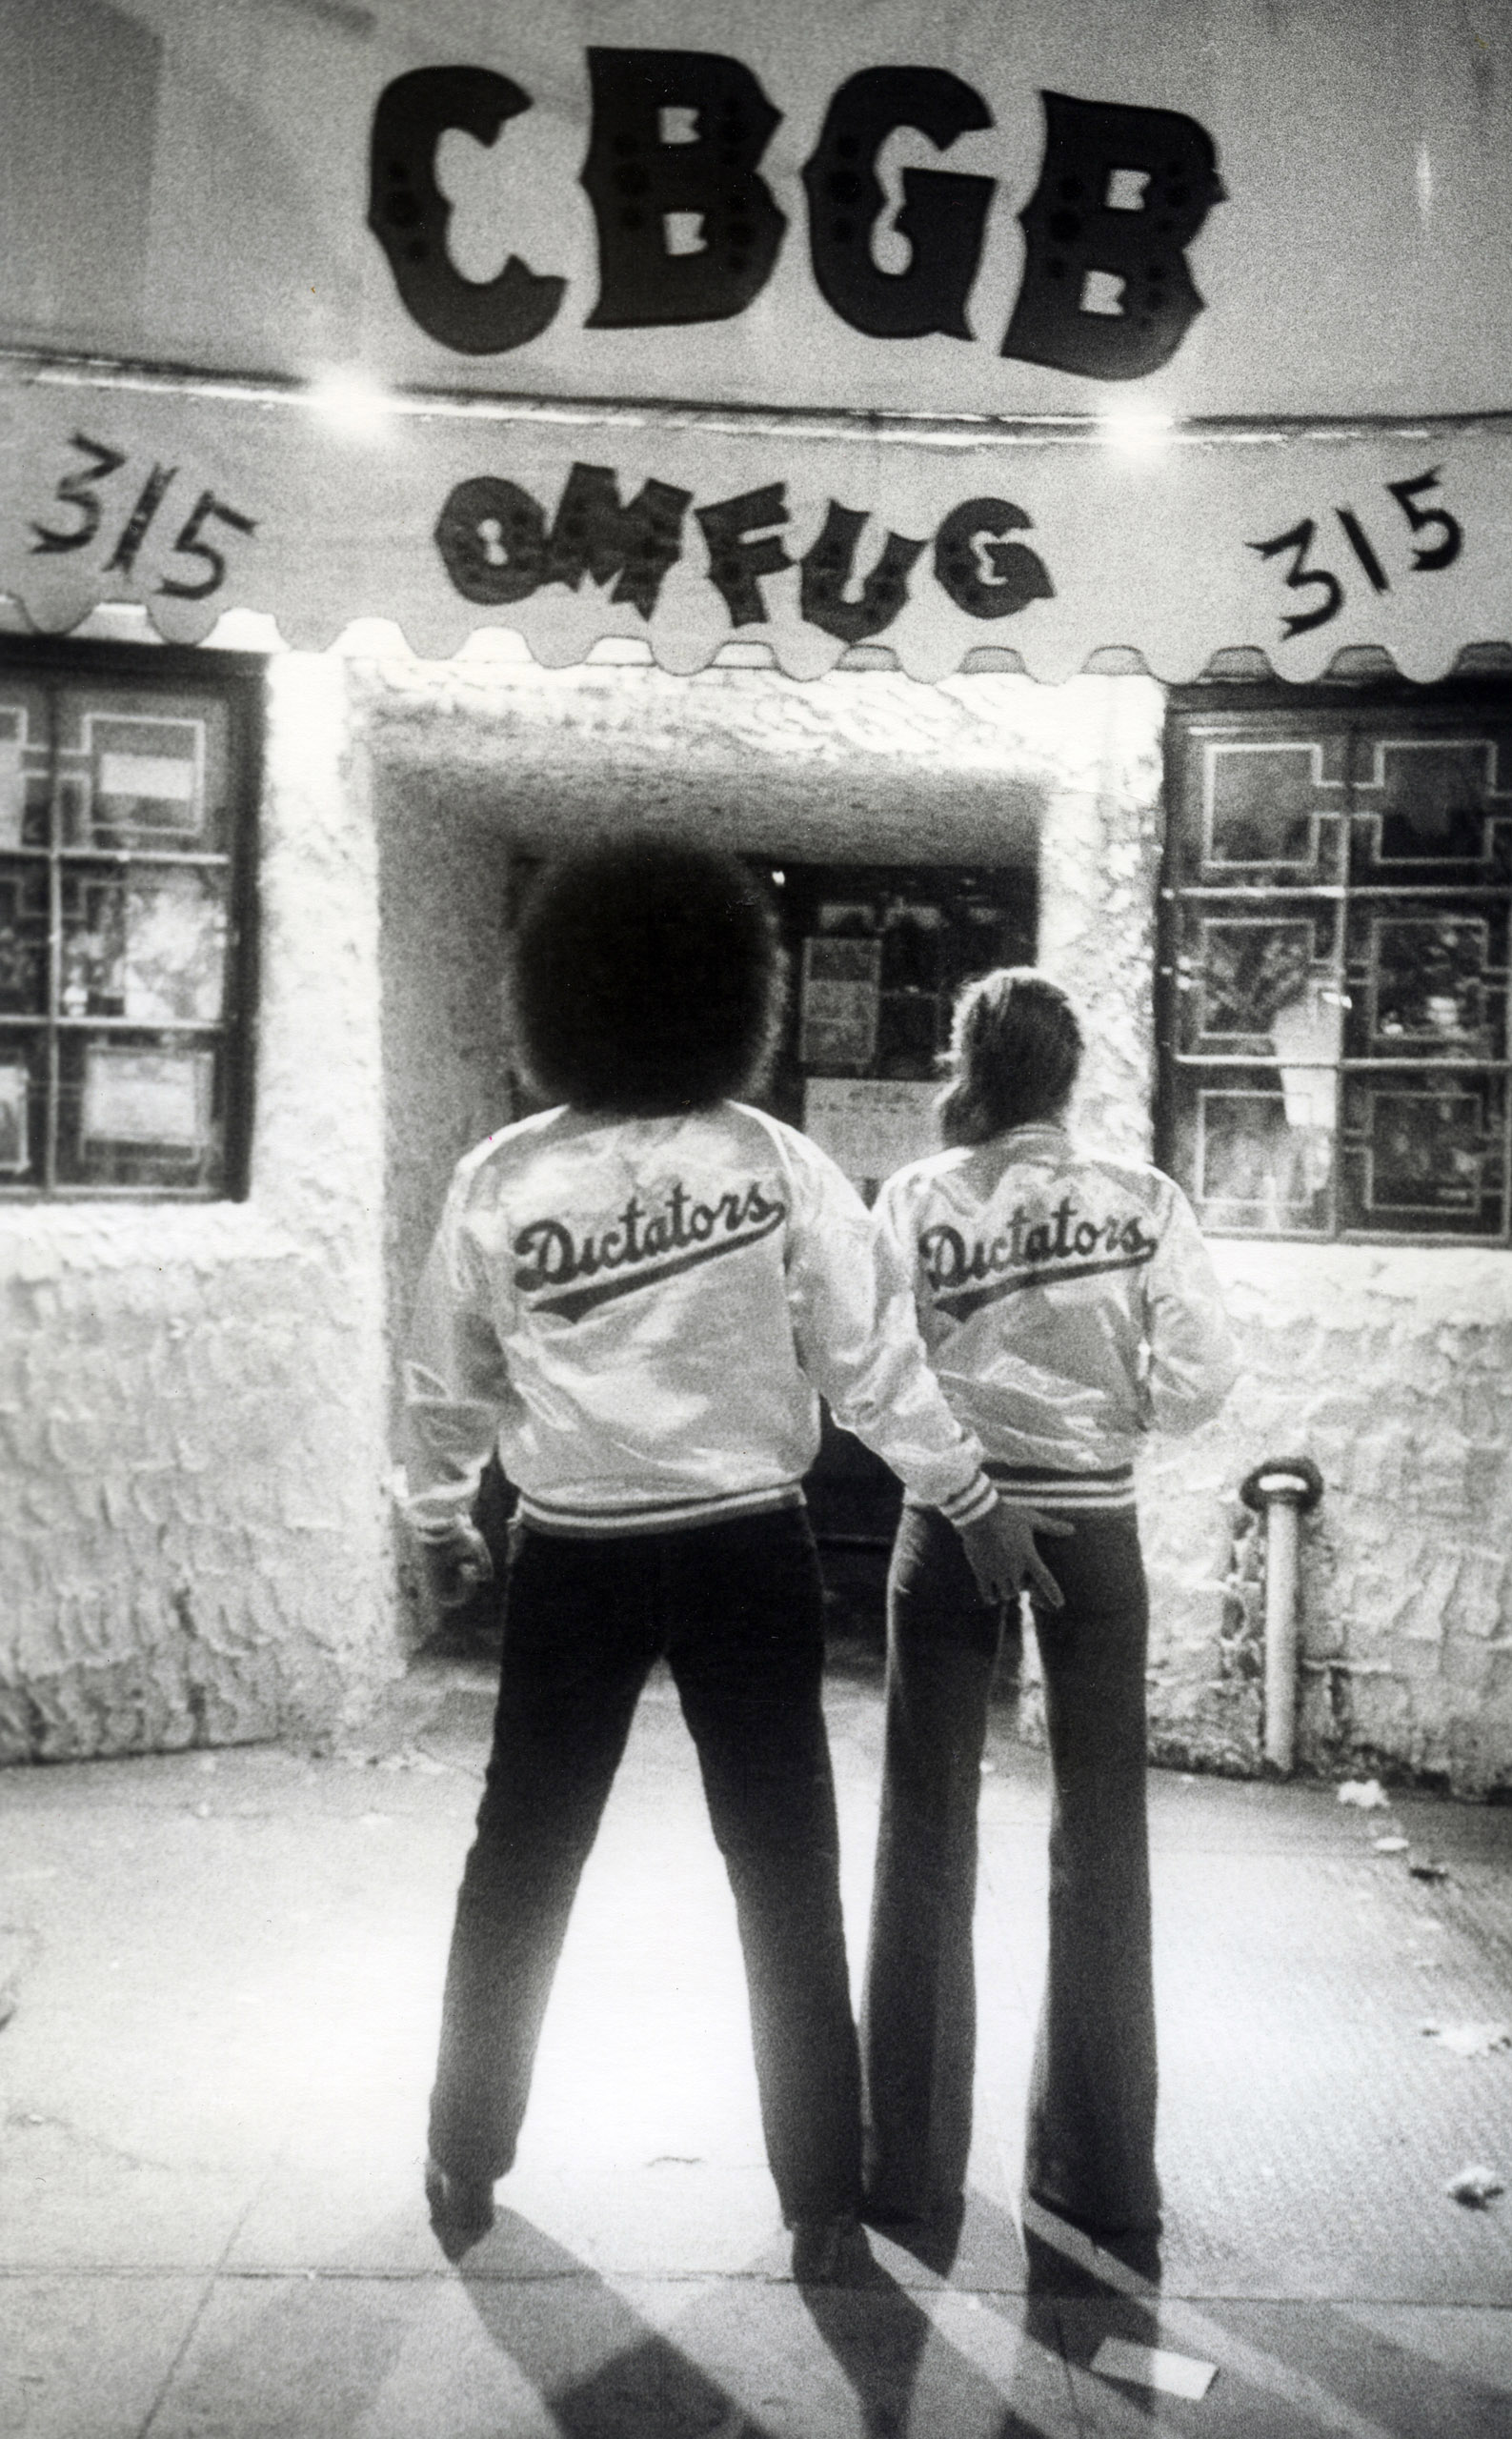 Handsome Dick Manitoba and Jody, Bowery, 1976.